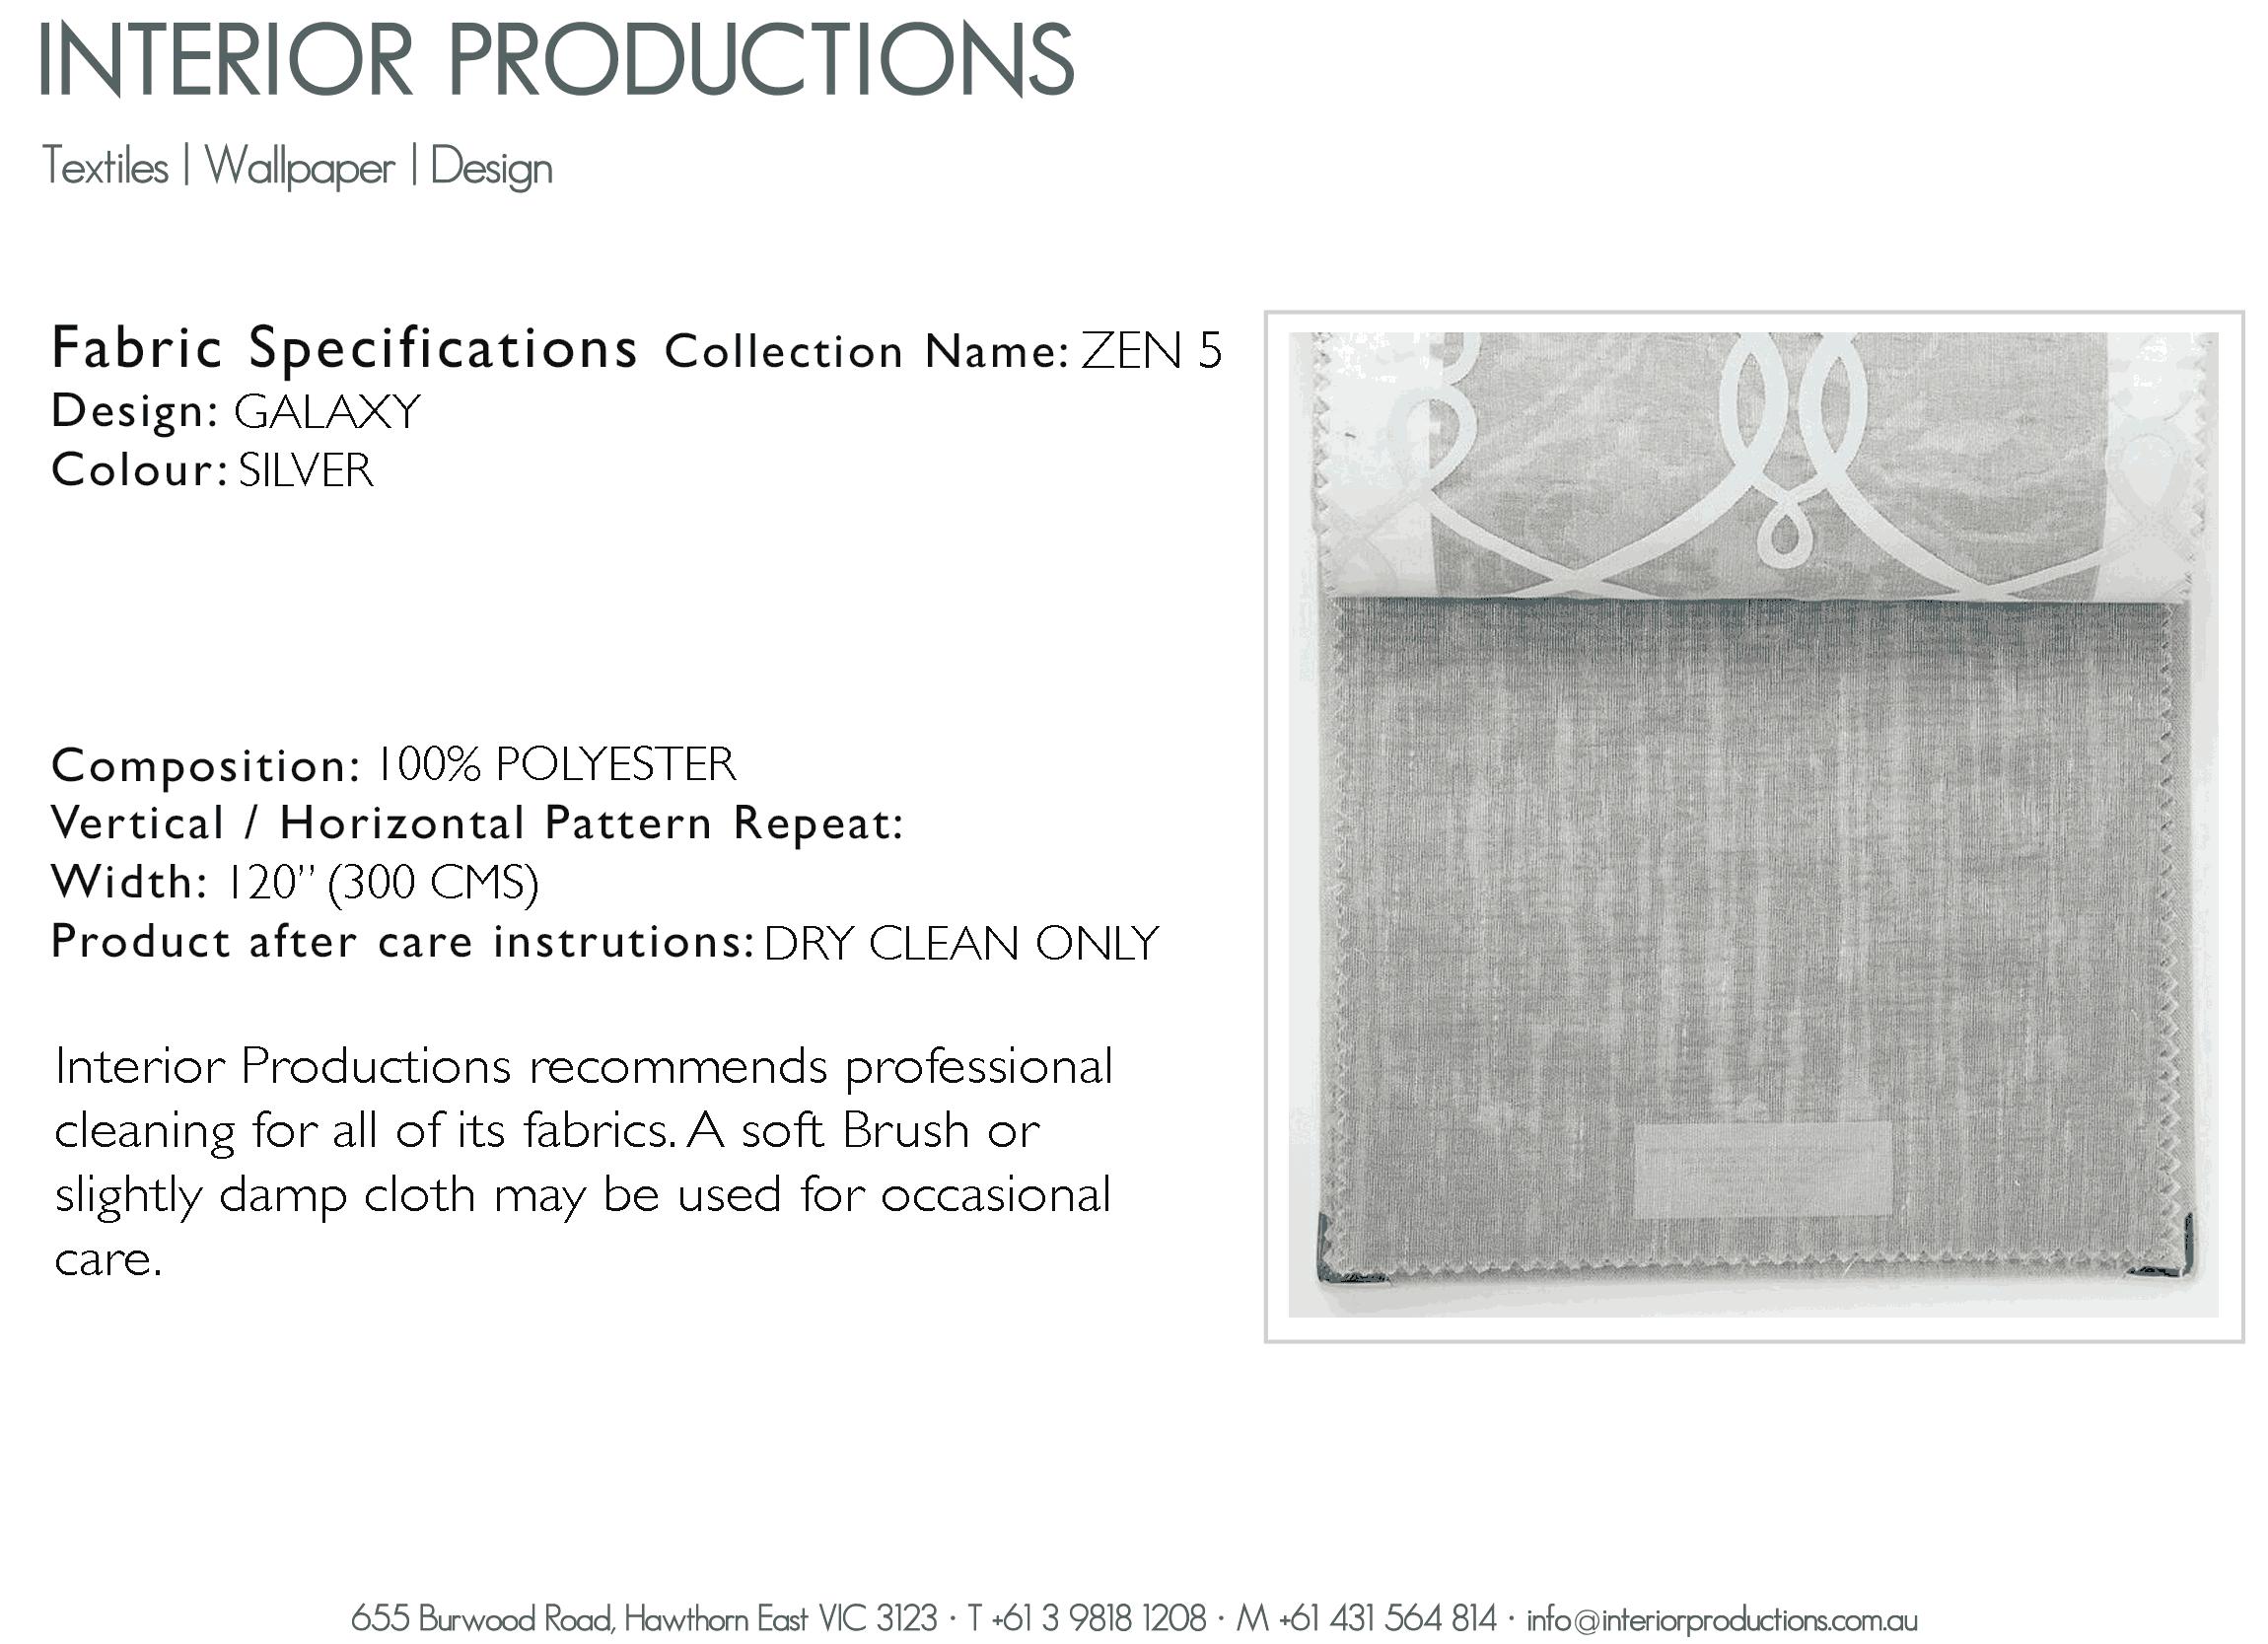 interior_productions_GALAXY---SILVER